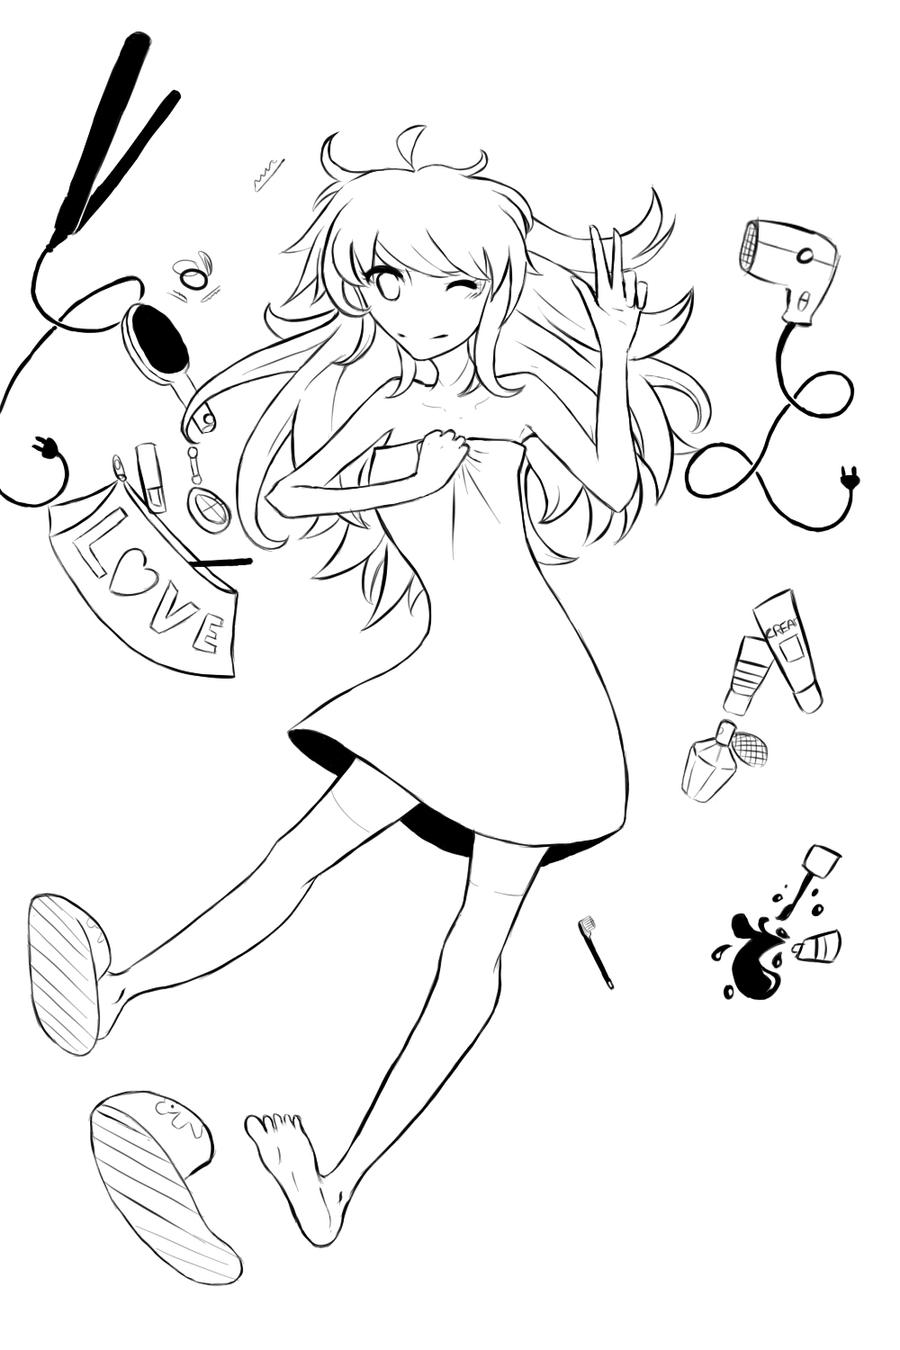 +Bathroom Girl+ by lumiorah